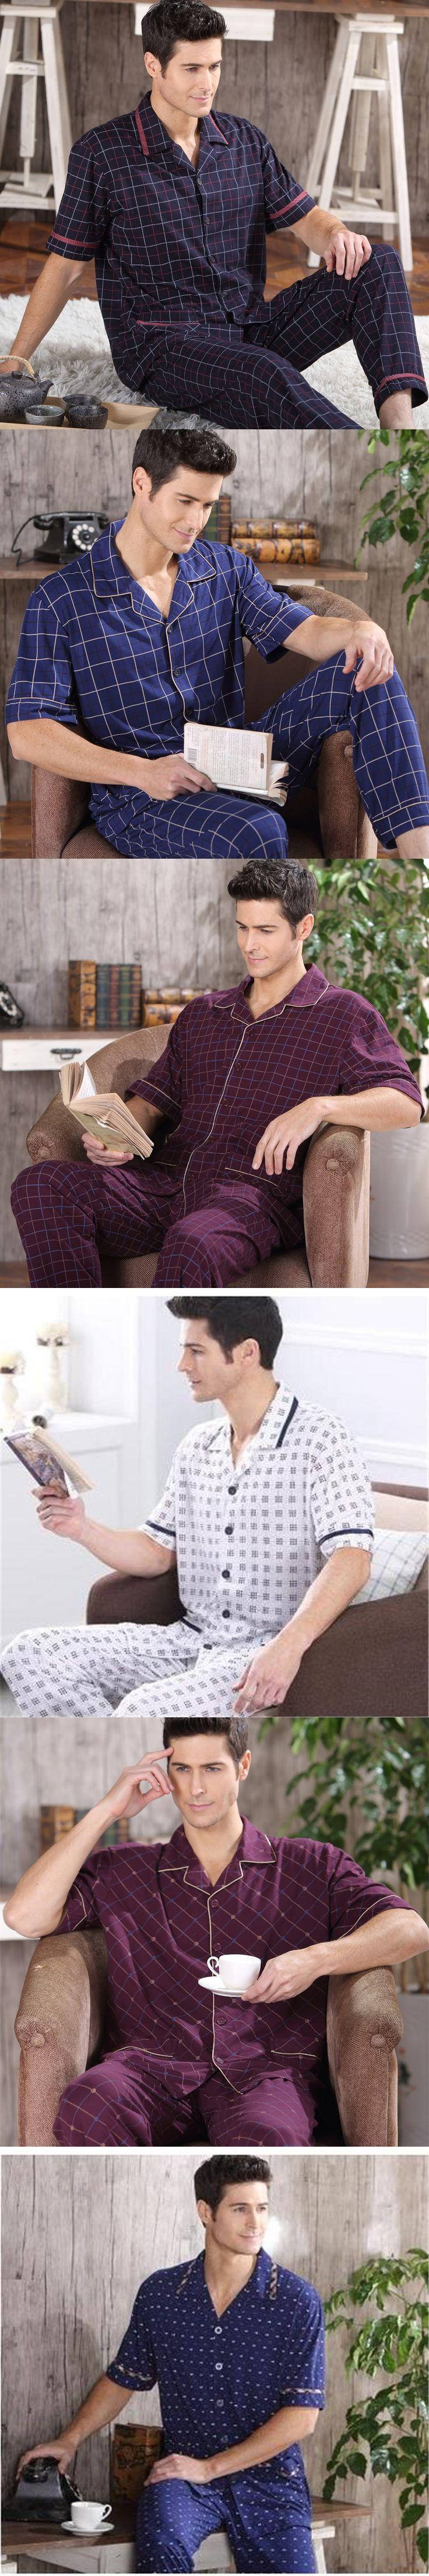 2017 NEW Cotton Pajamas Set For Men Short Sleeve Trousers Sleepwear Pyjamas Men Lounge Pajama Set Plus size M-5XL